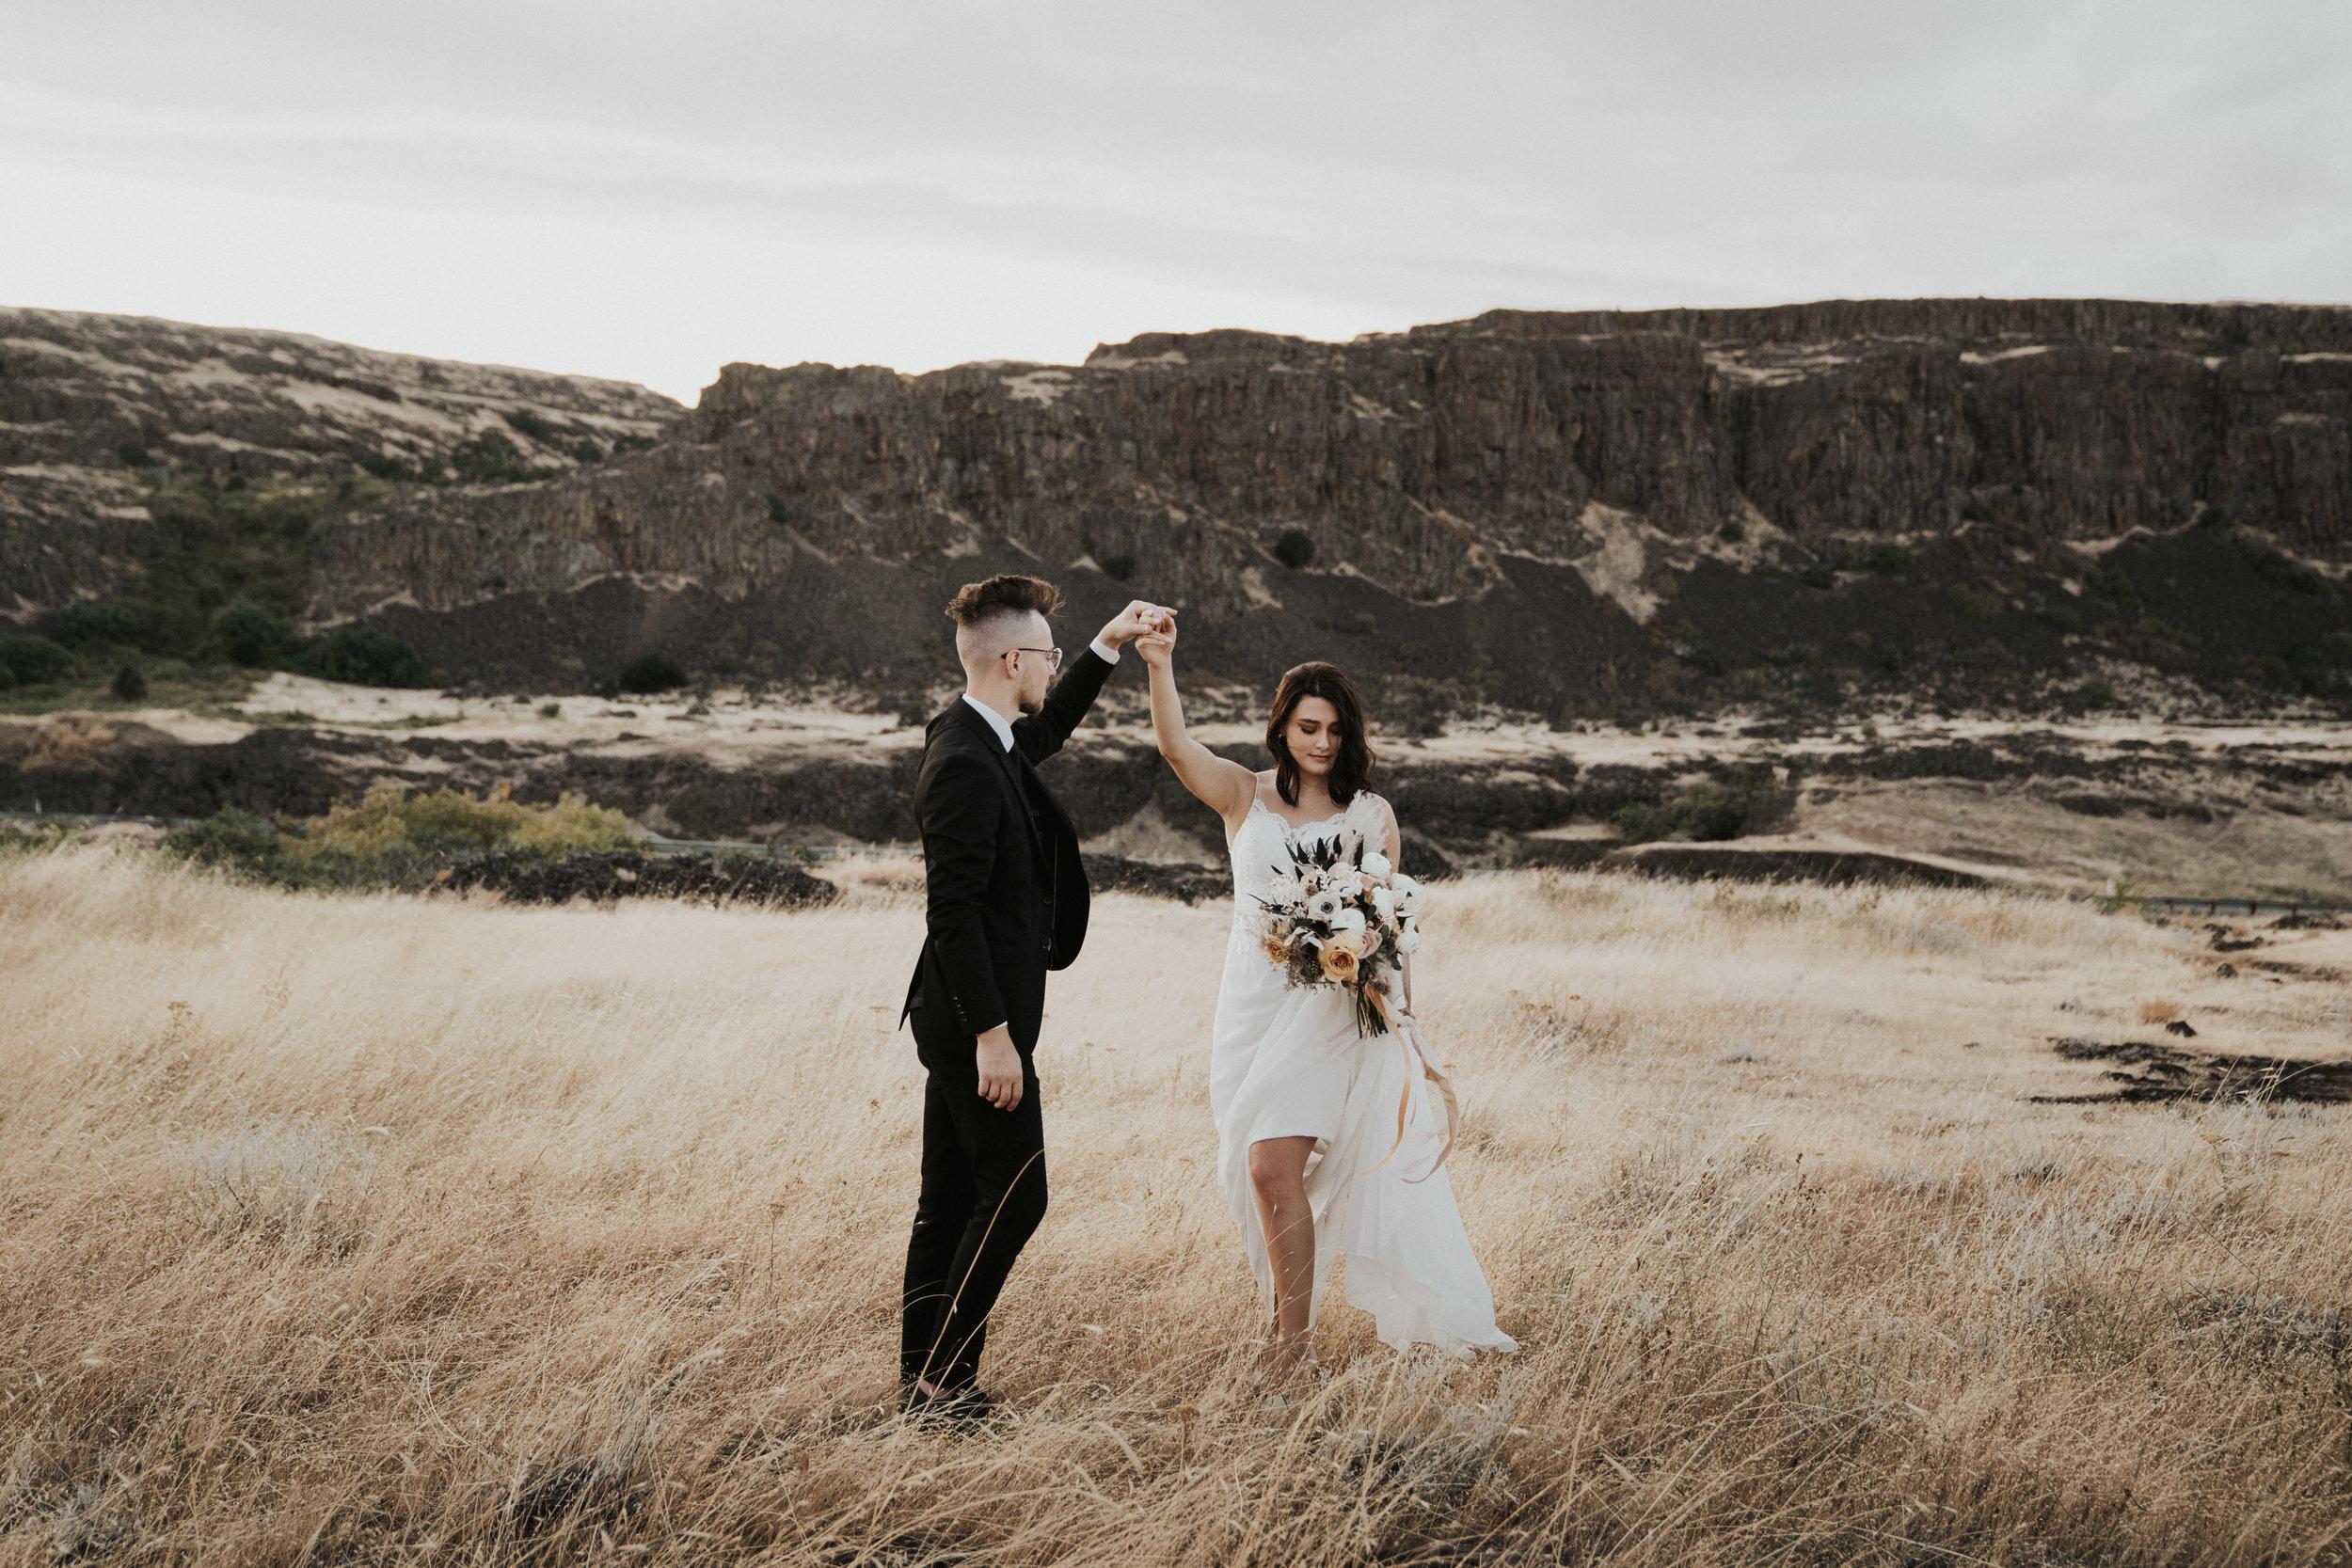 columbia-river-gorge-wedding-elopement-inspiration-20.jpg